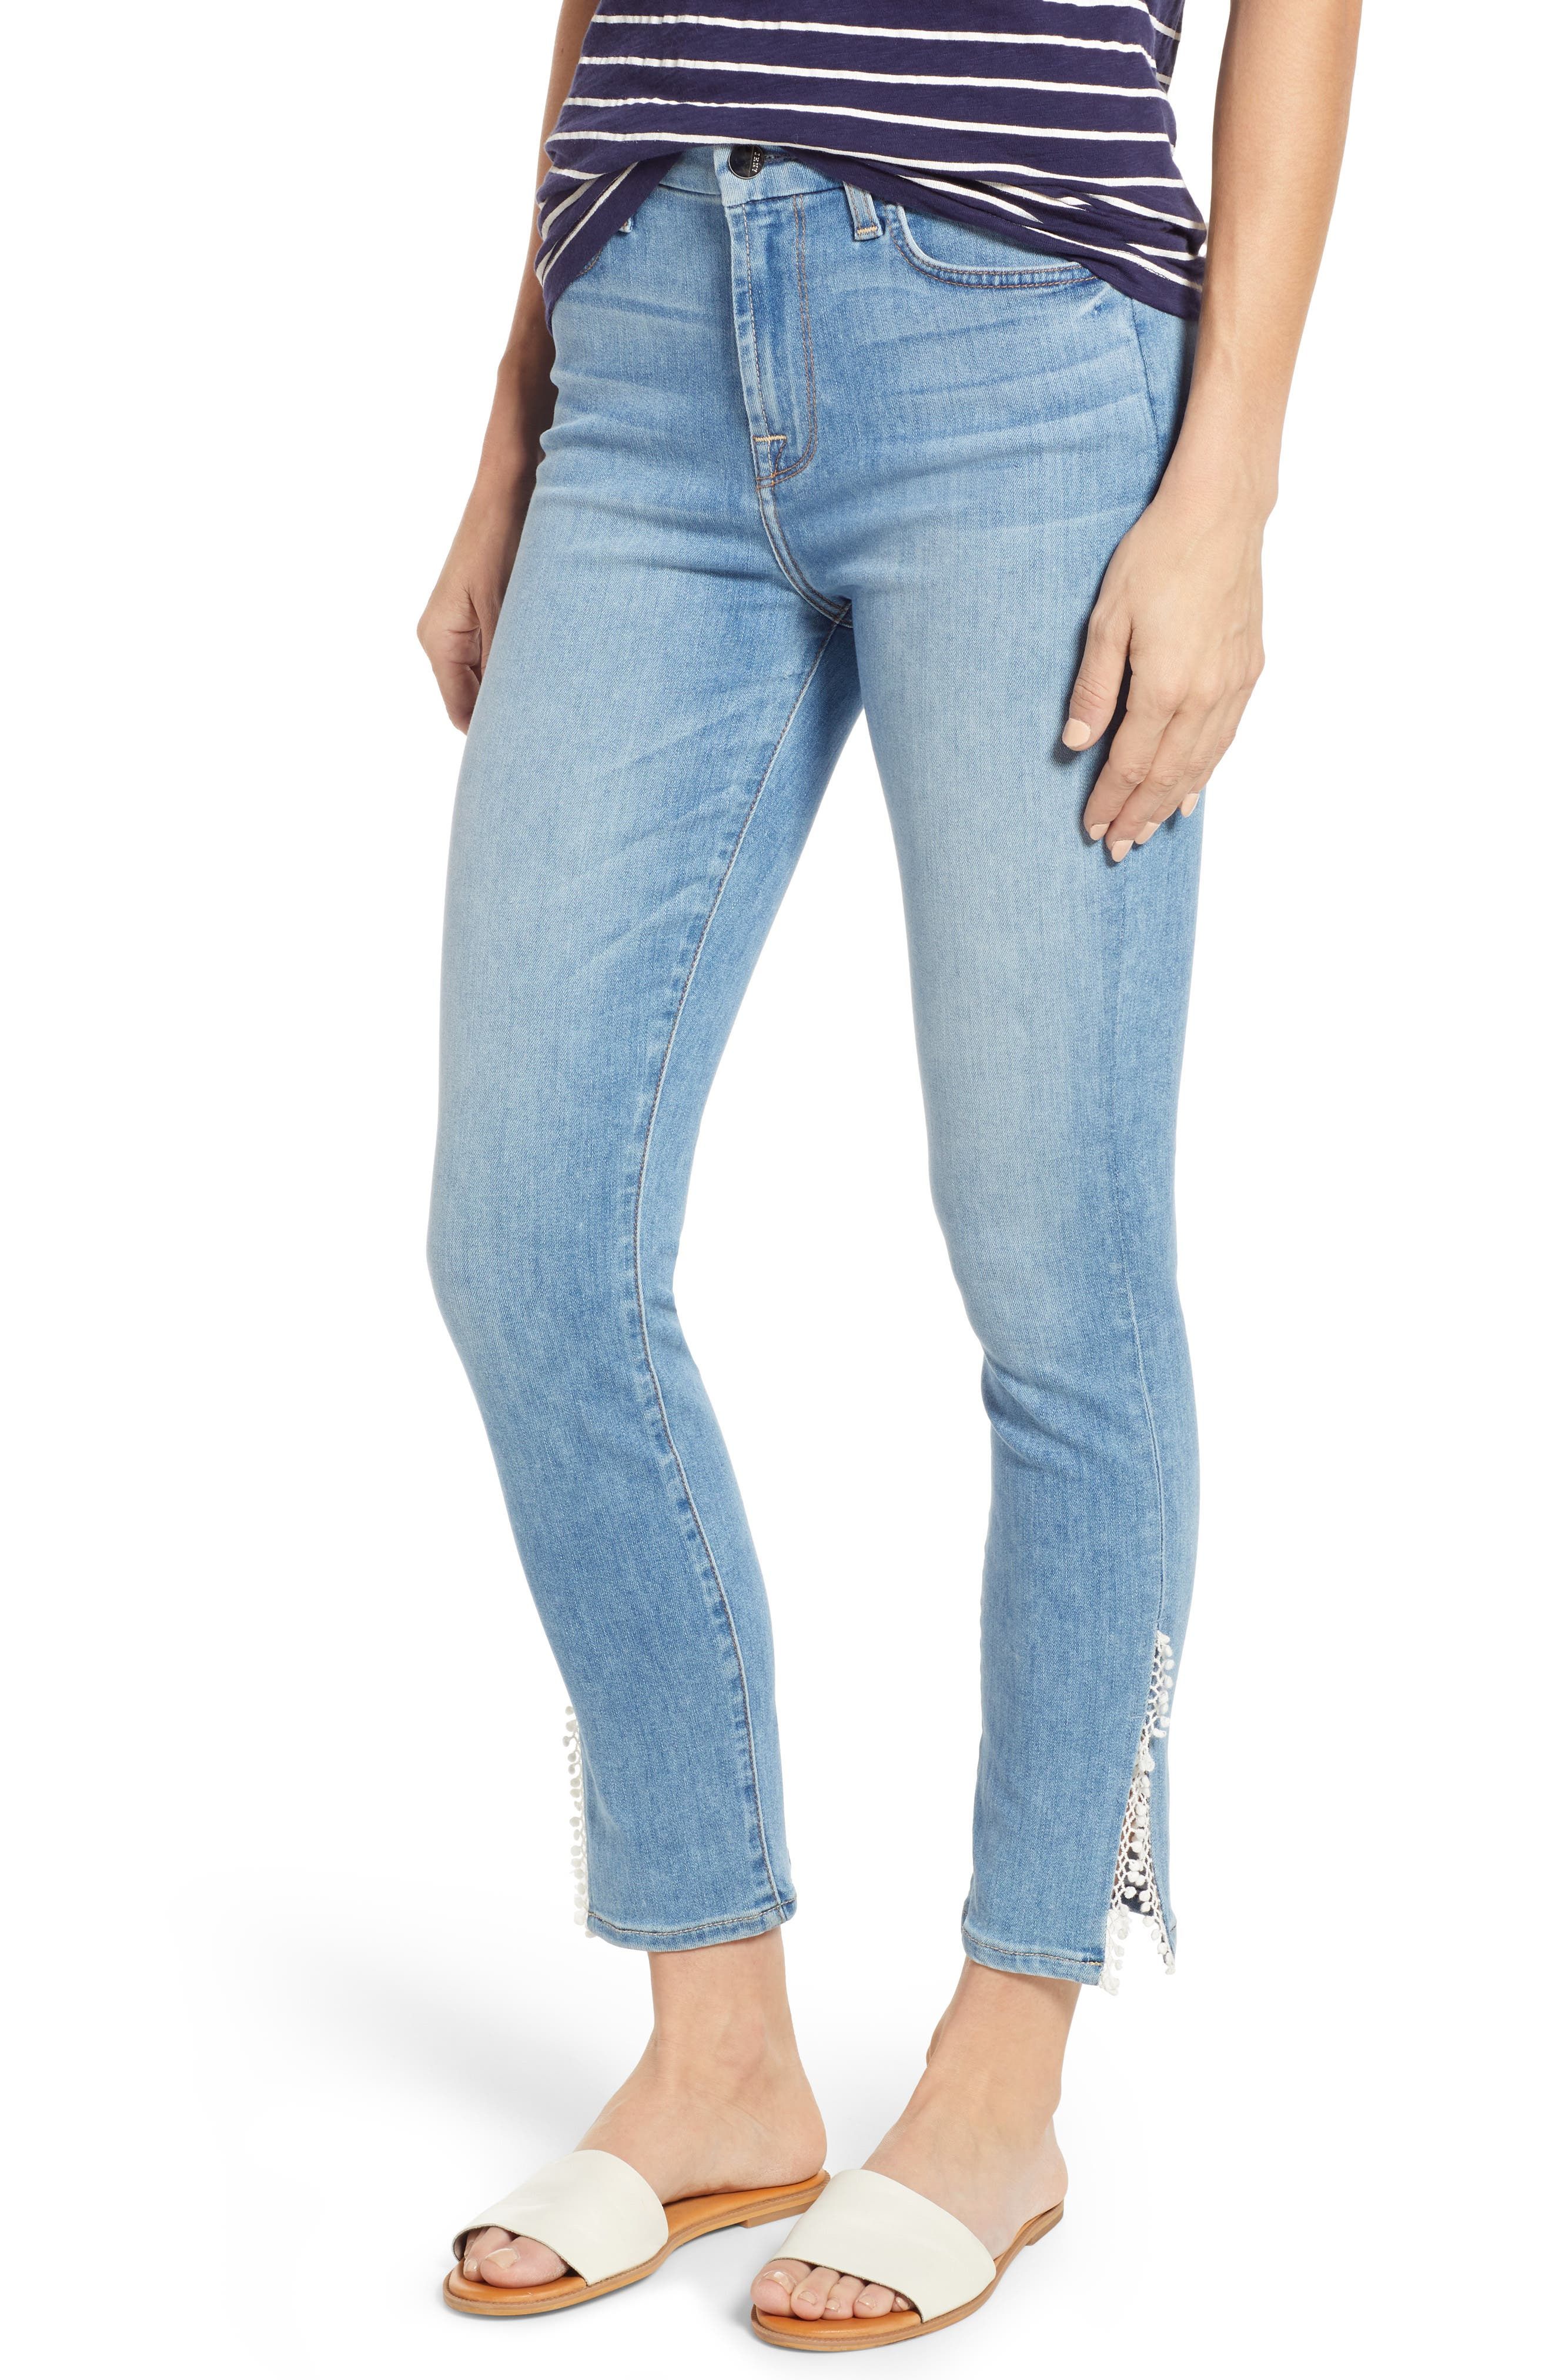 JEN7 BY 7 FOR ALL MANKIND Pompom Detail Crop Skinny Jeans, Main, color, LA QUINTA POM POM